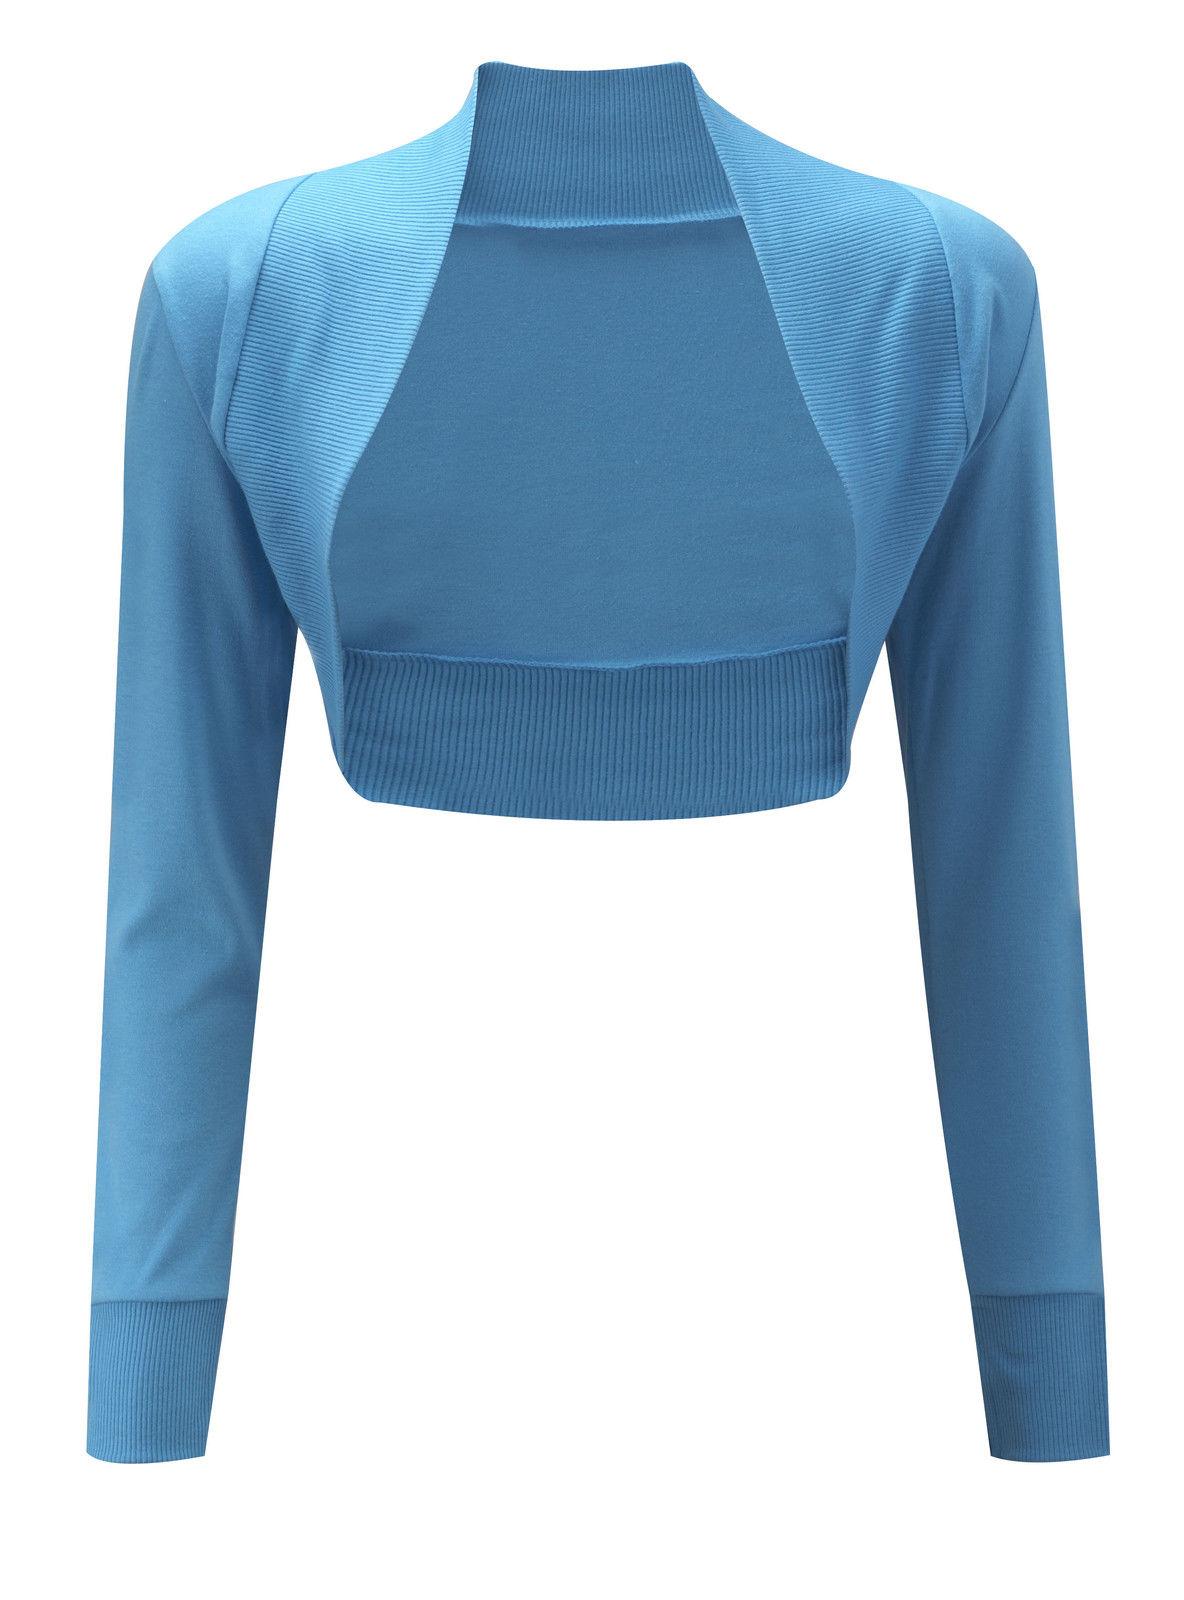 New-Ladies-Womens-Long-Sleeve-Shrug-UK-8-10-12-14